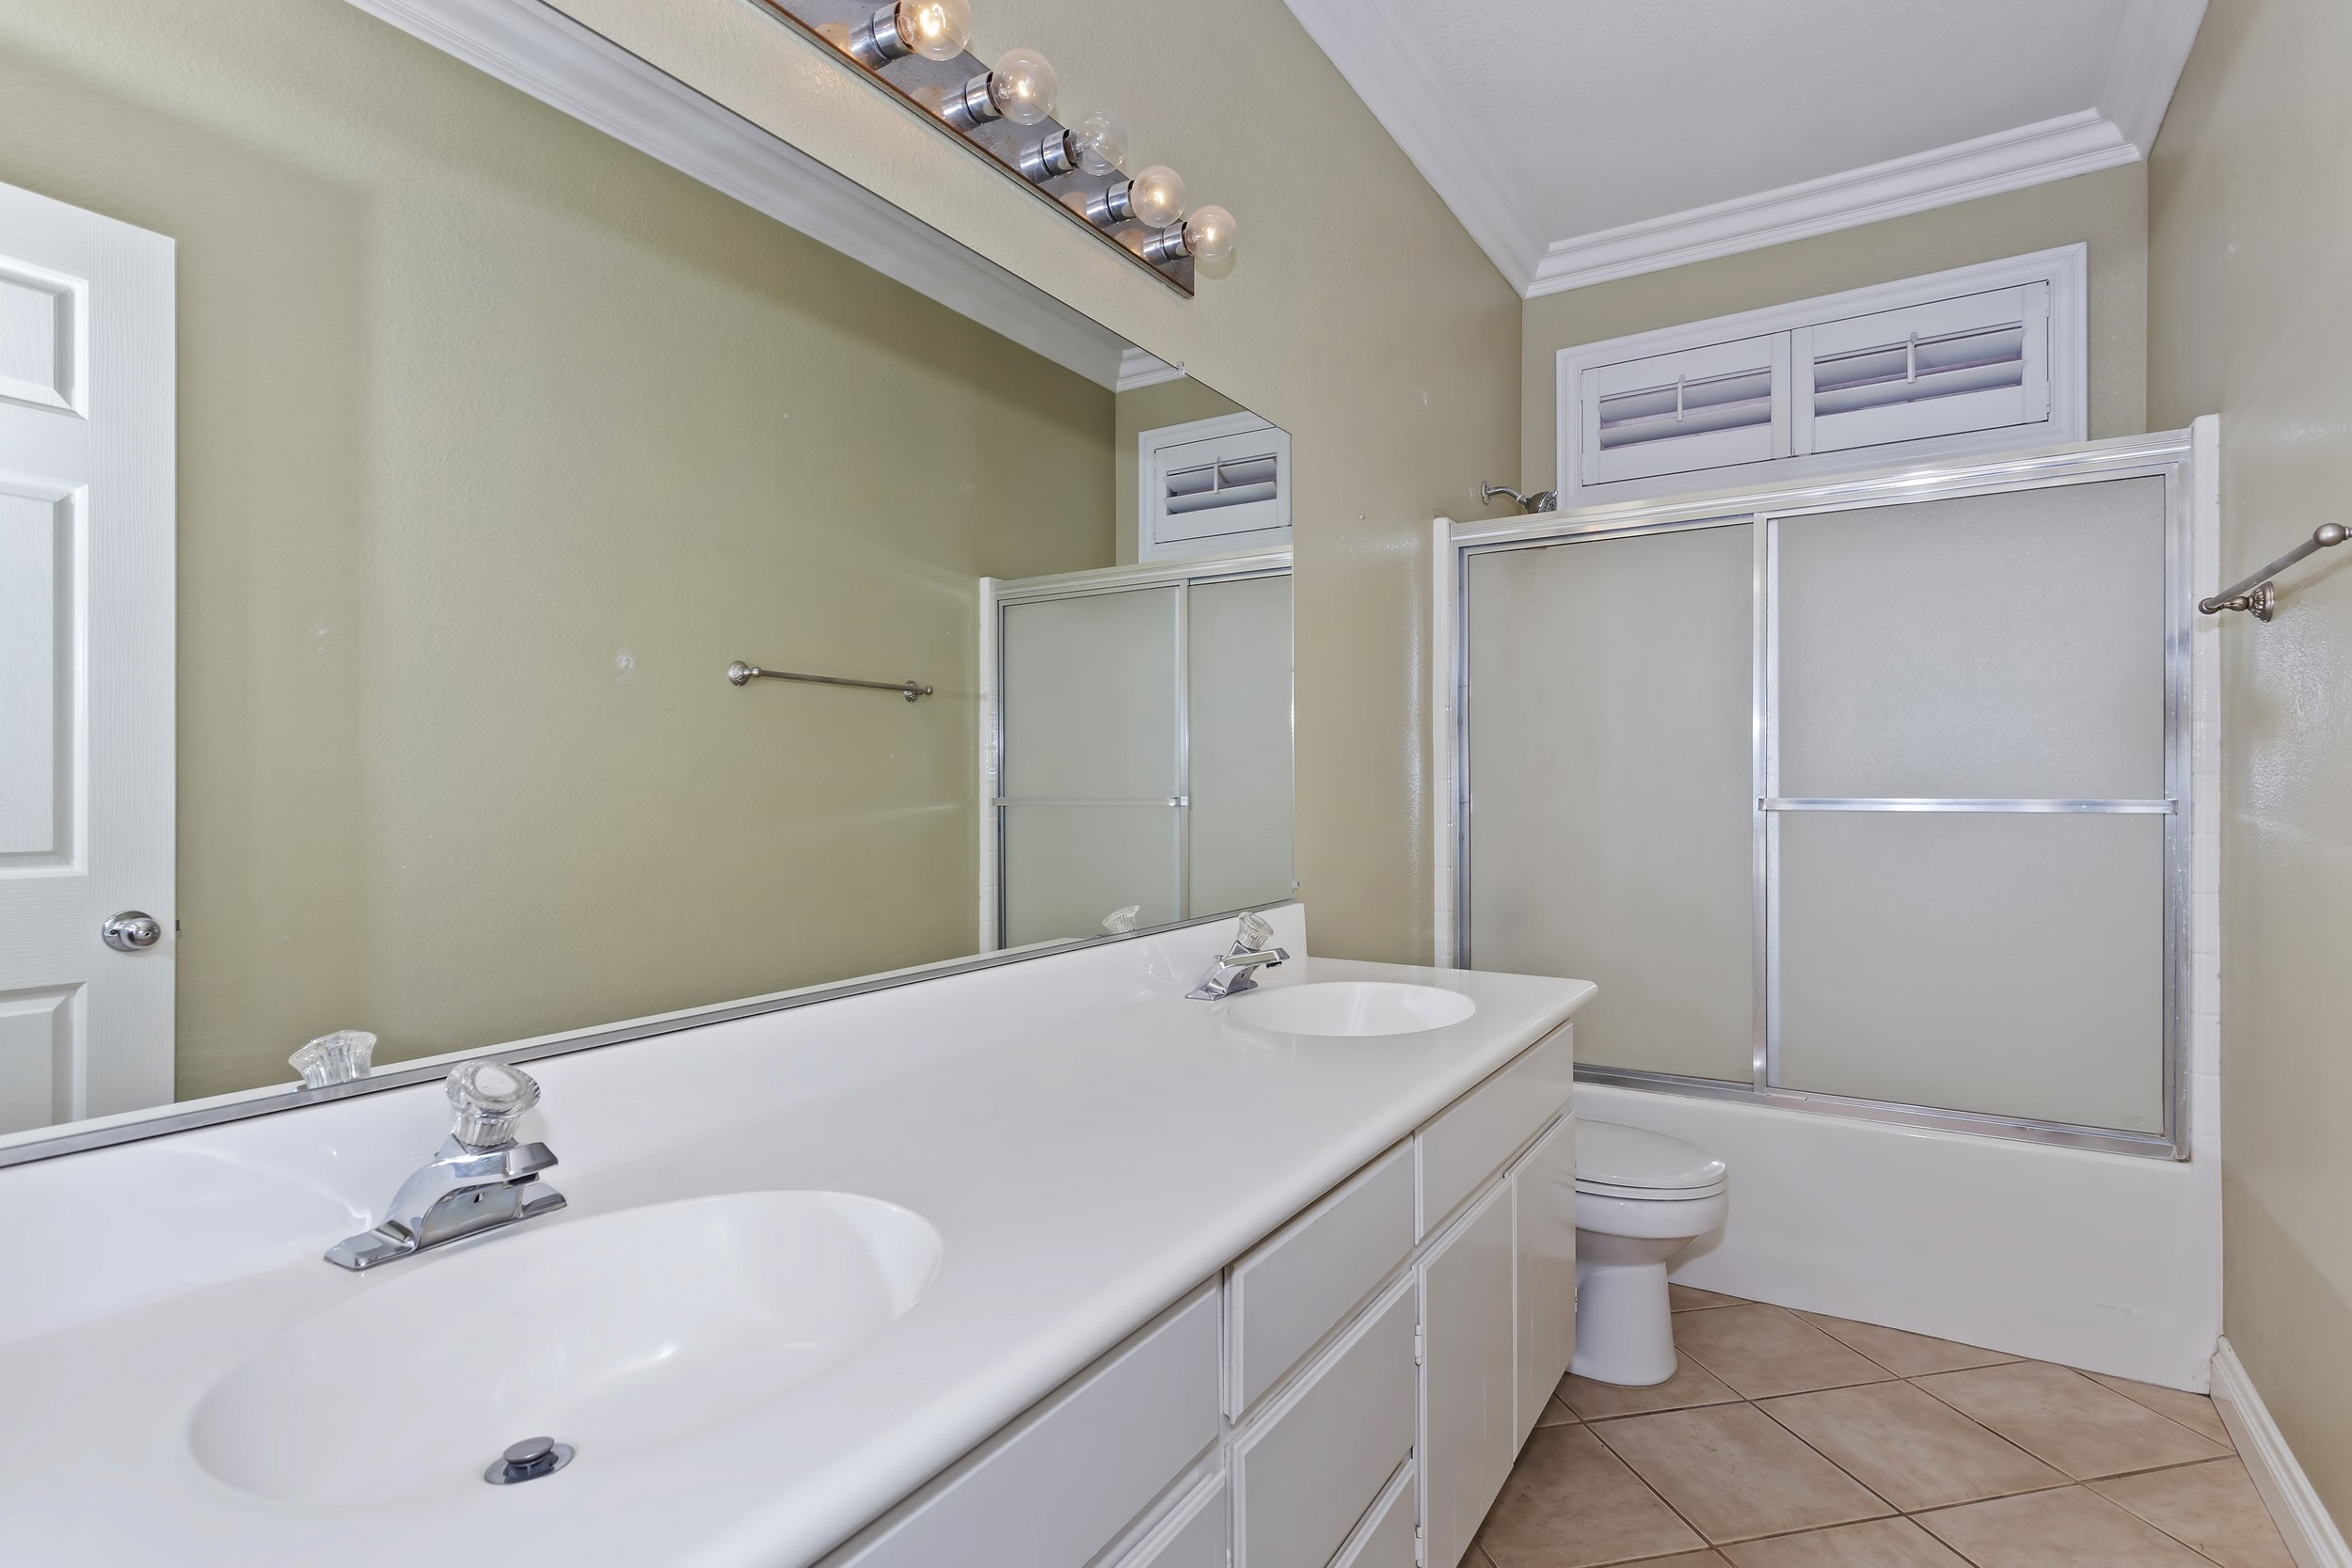 023_Bathroom.jpg